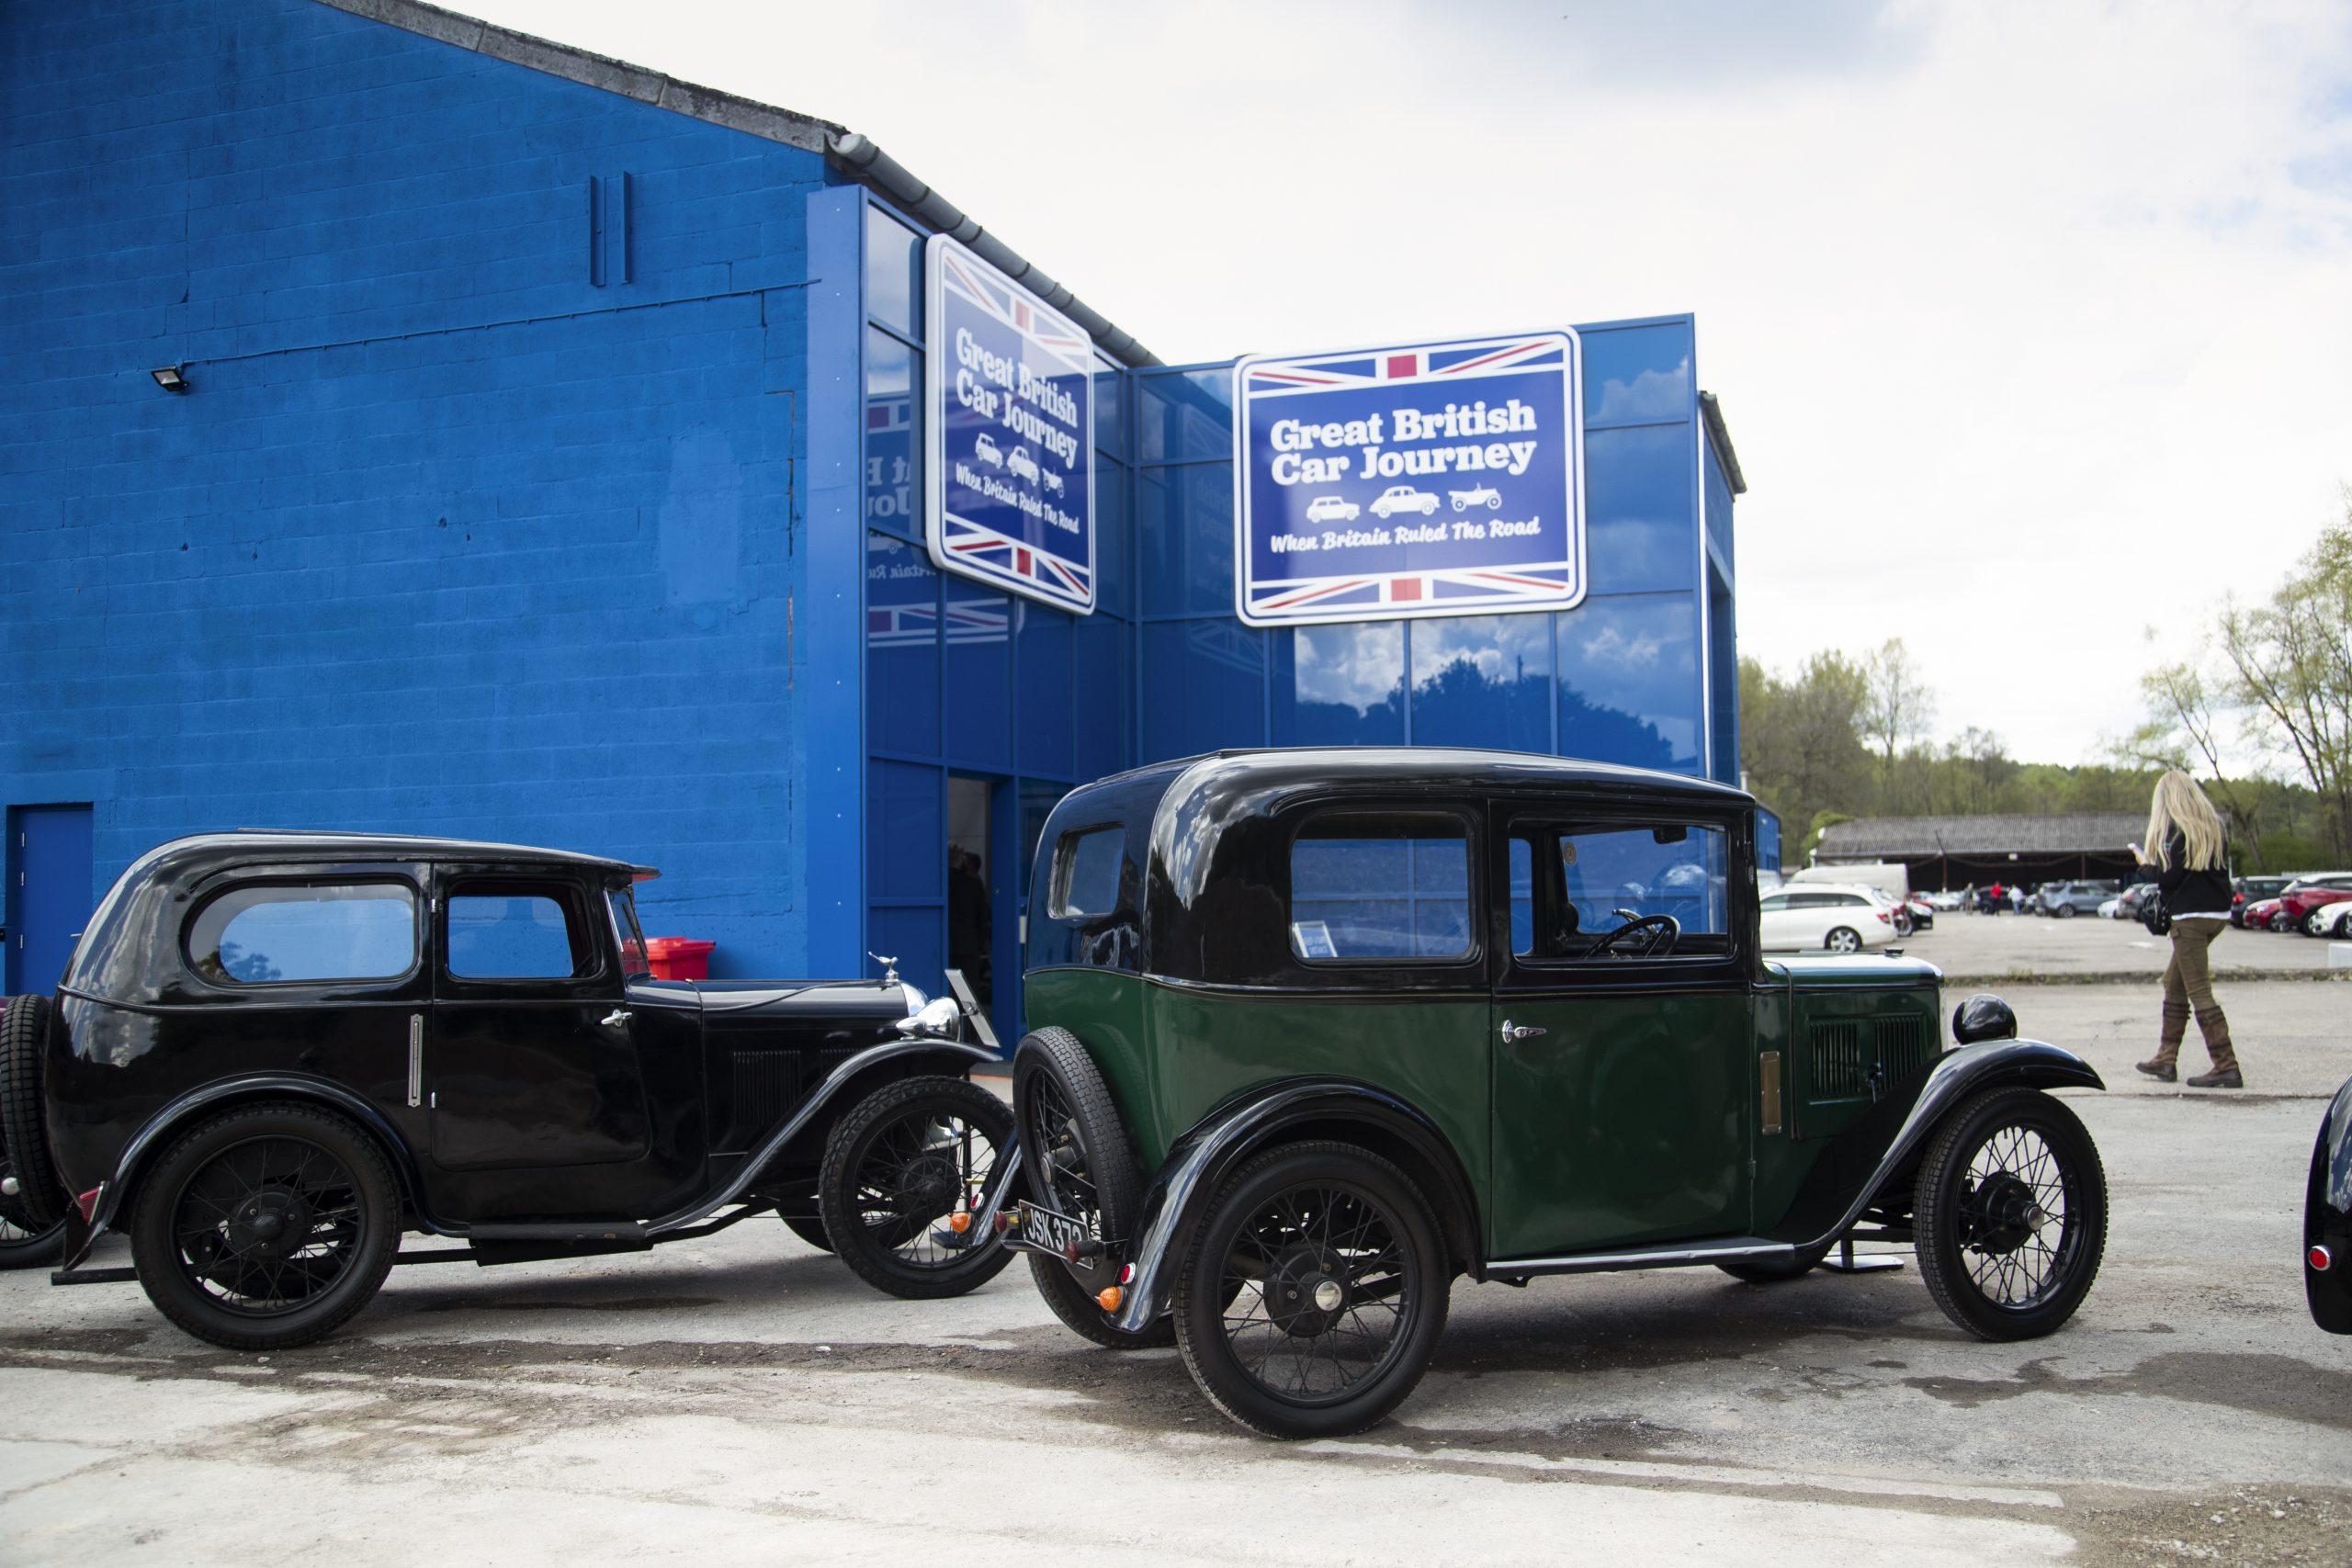 Great British Car Journey Motors Into Derbyshire